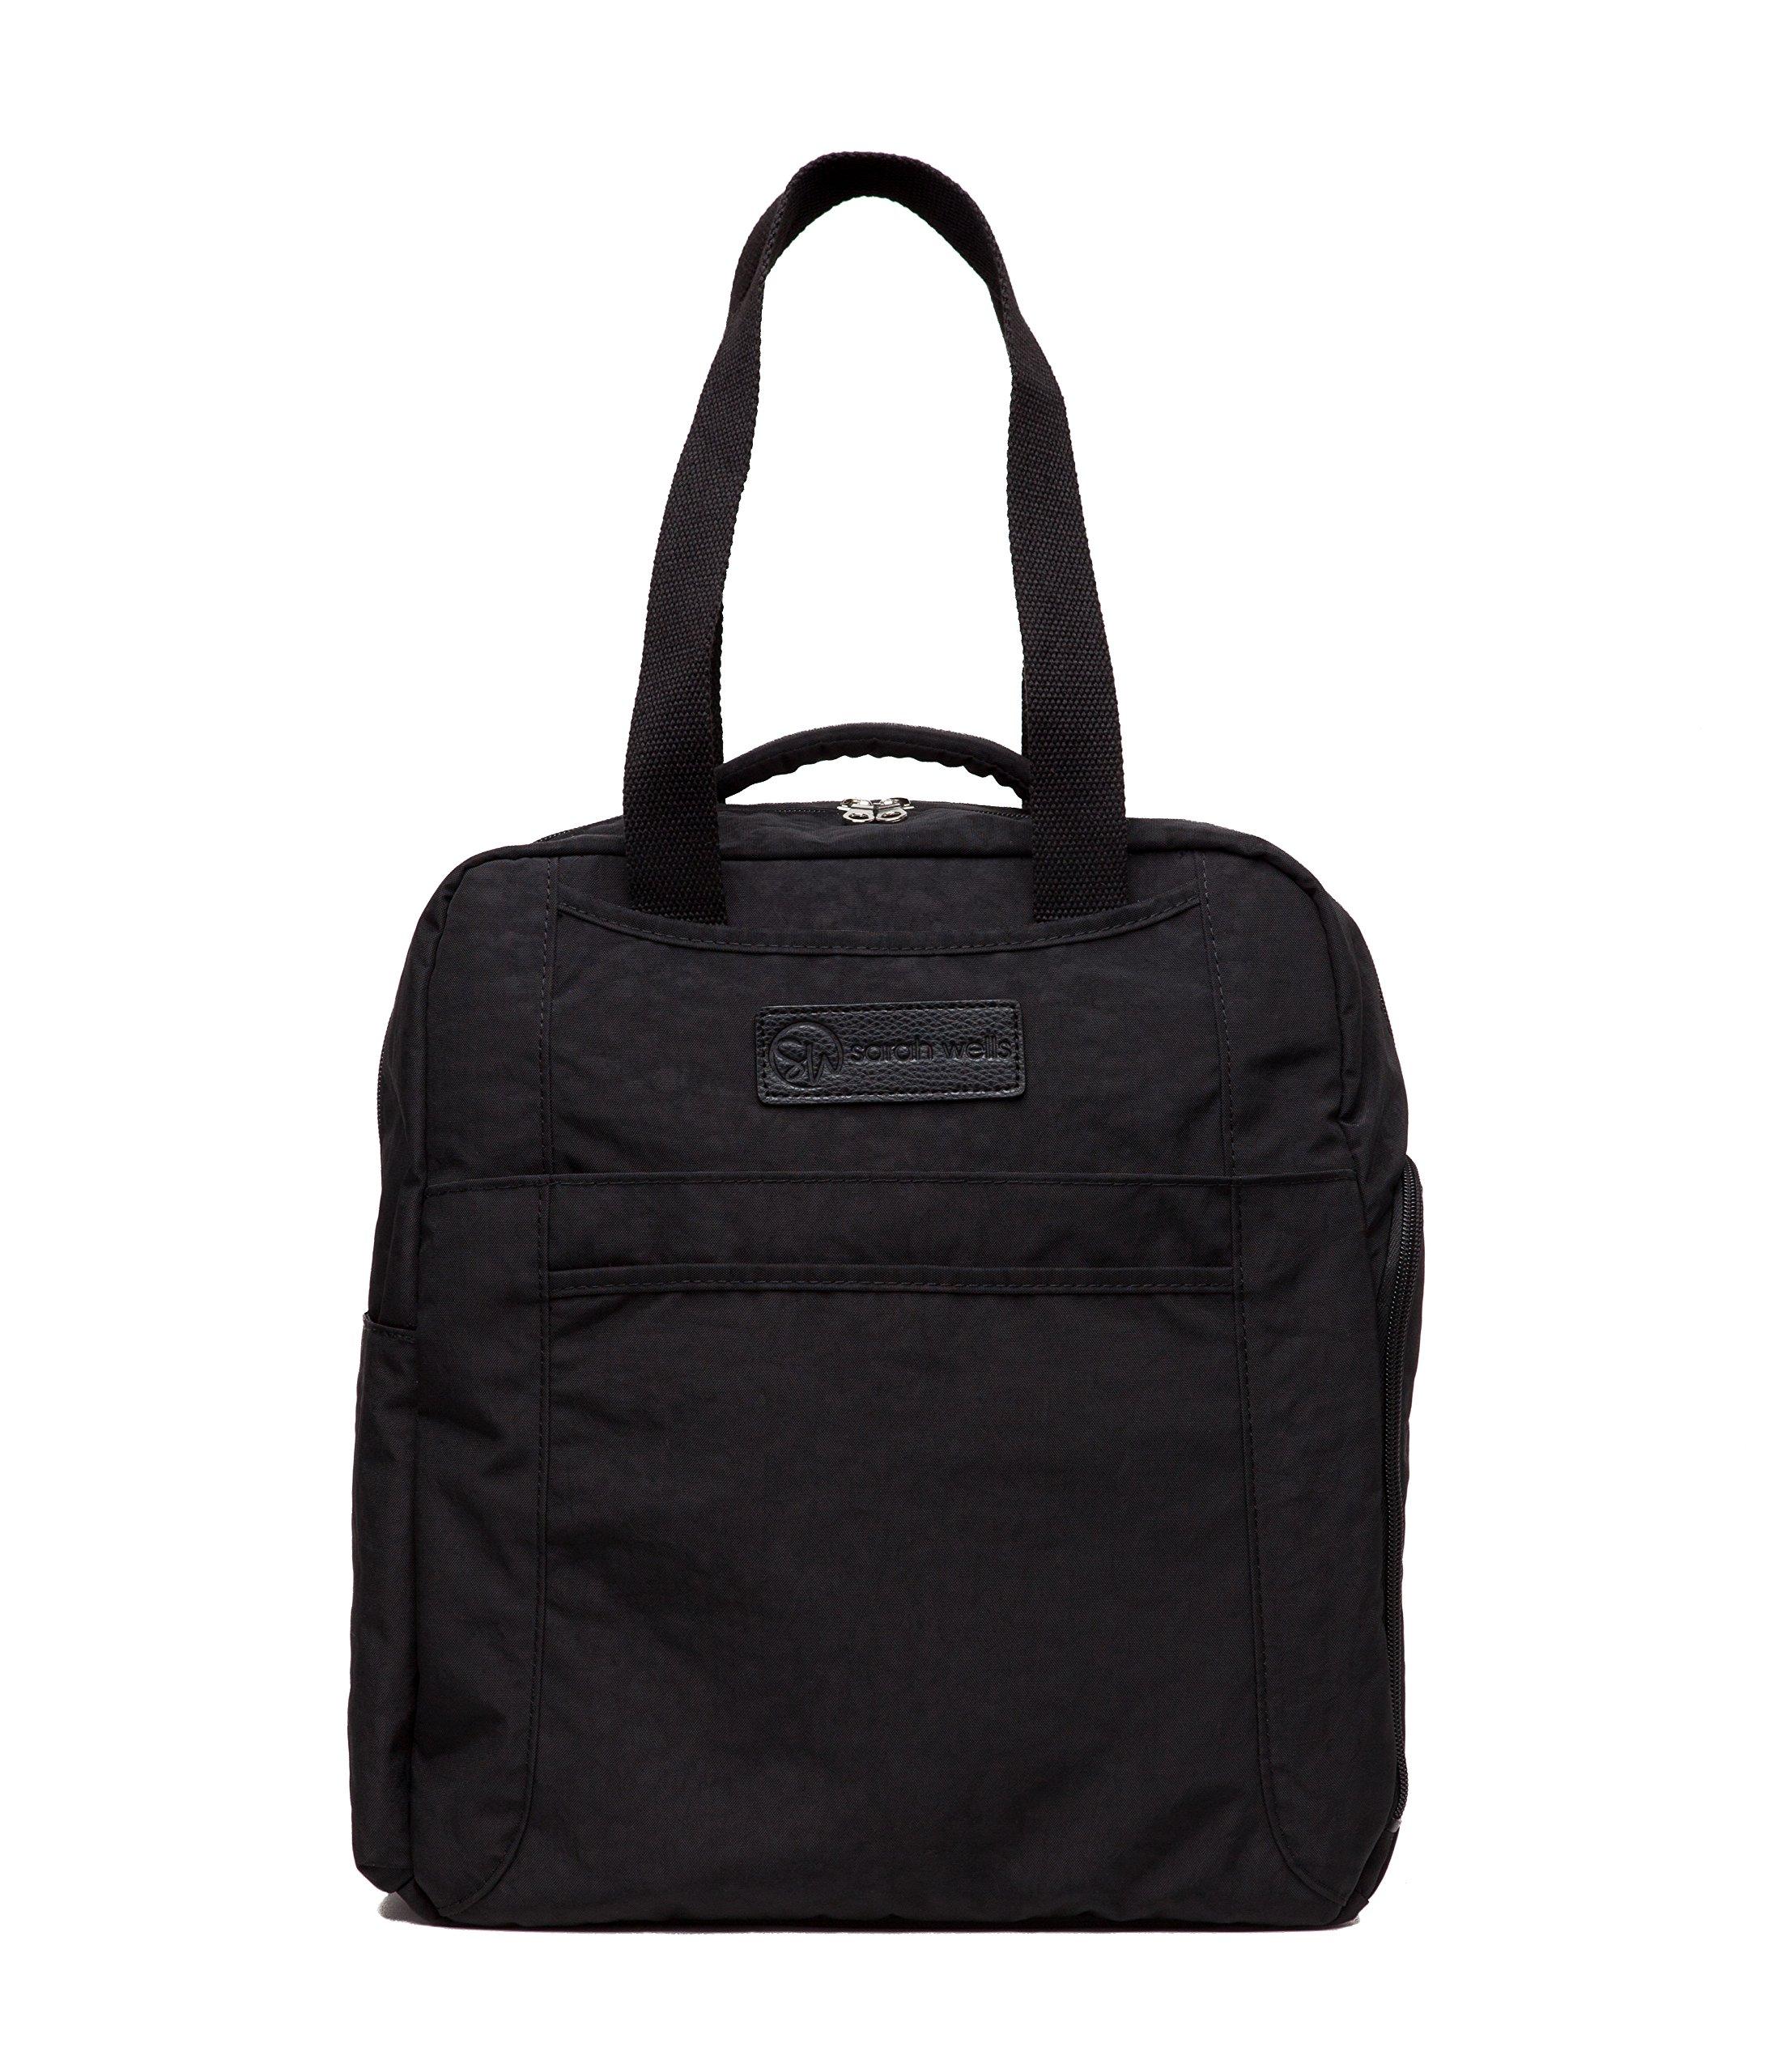 Sarah Wells Kelly Convertible Breast Pump Bag and Backpack (Black) by Sarah Wells